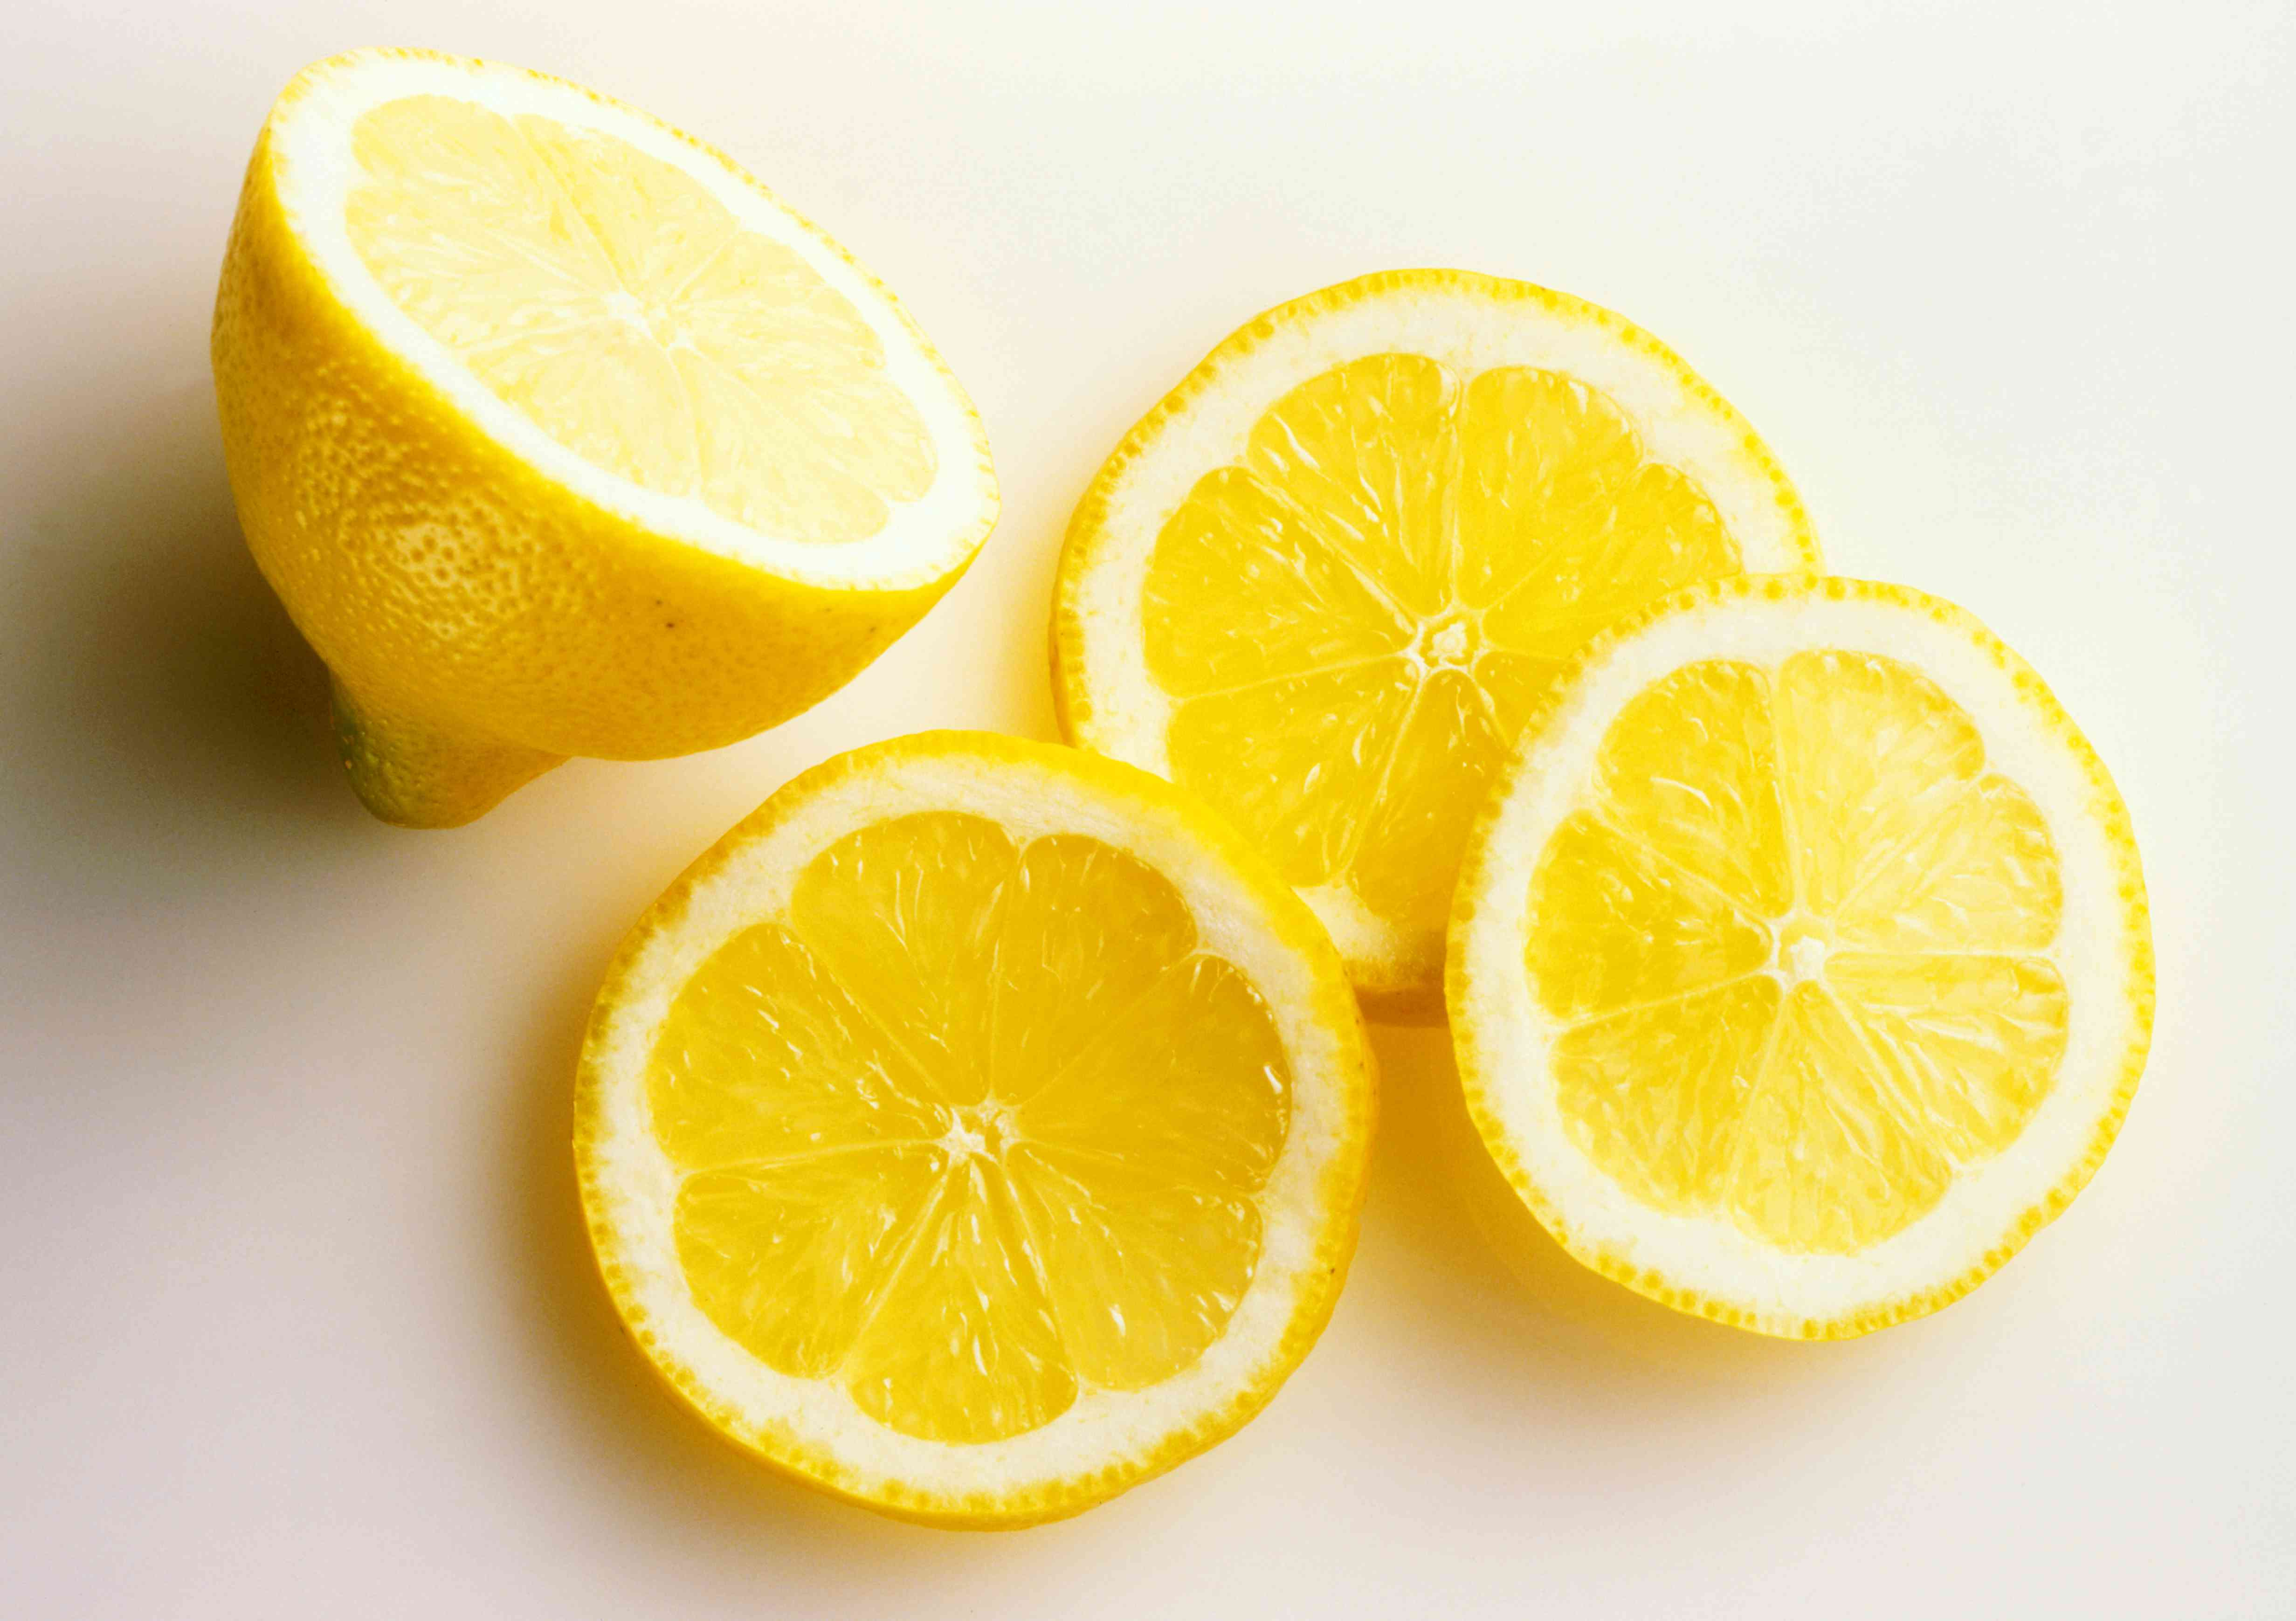 Teeth Whitening Home Remedies